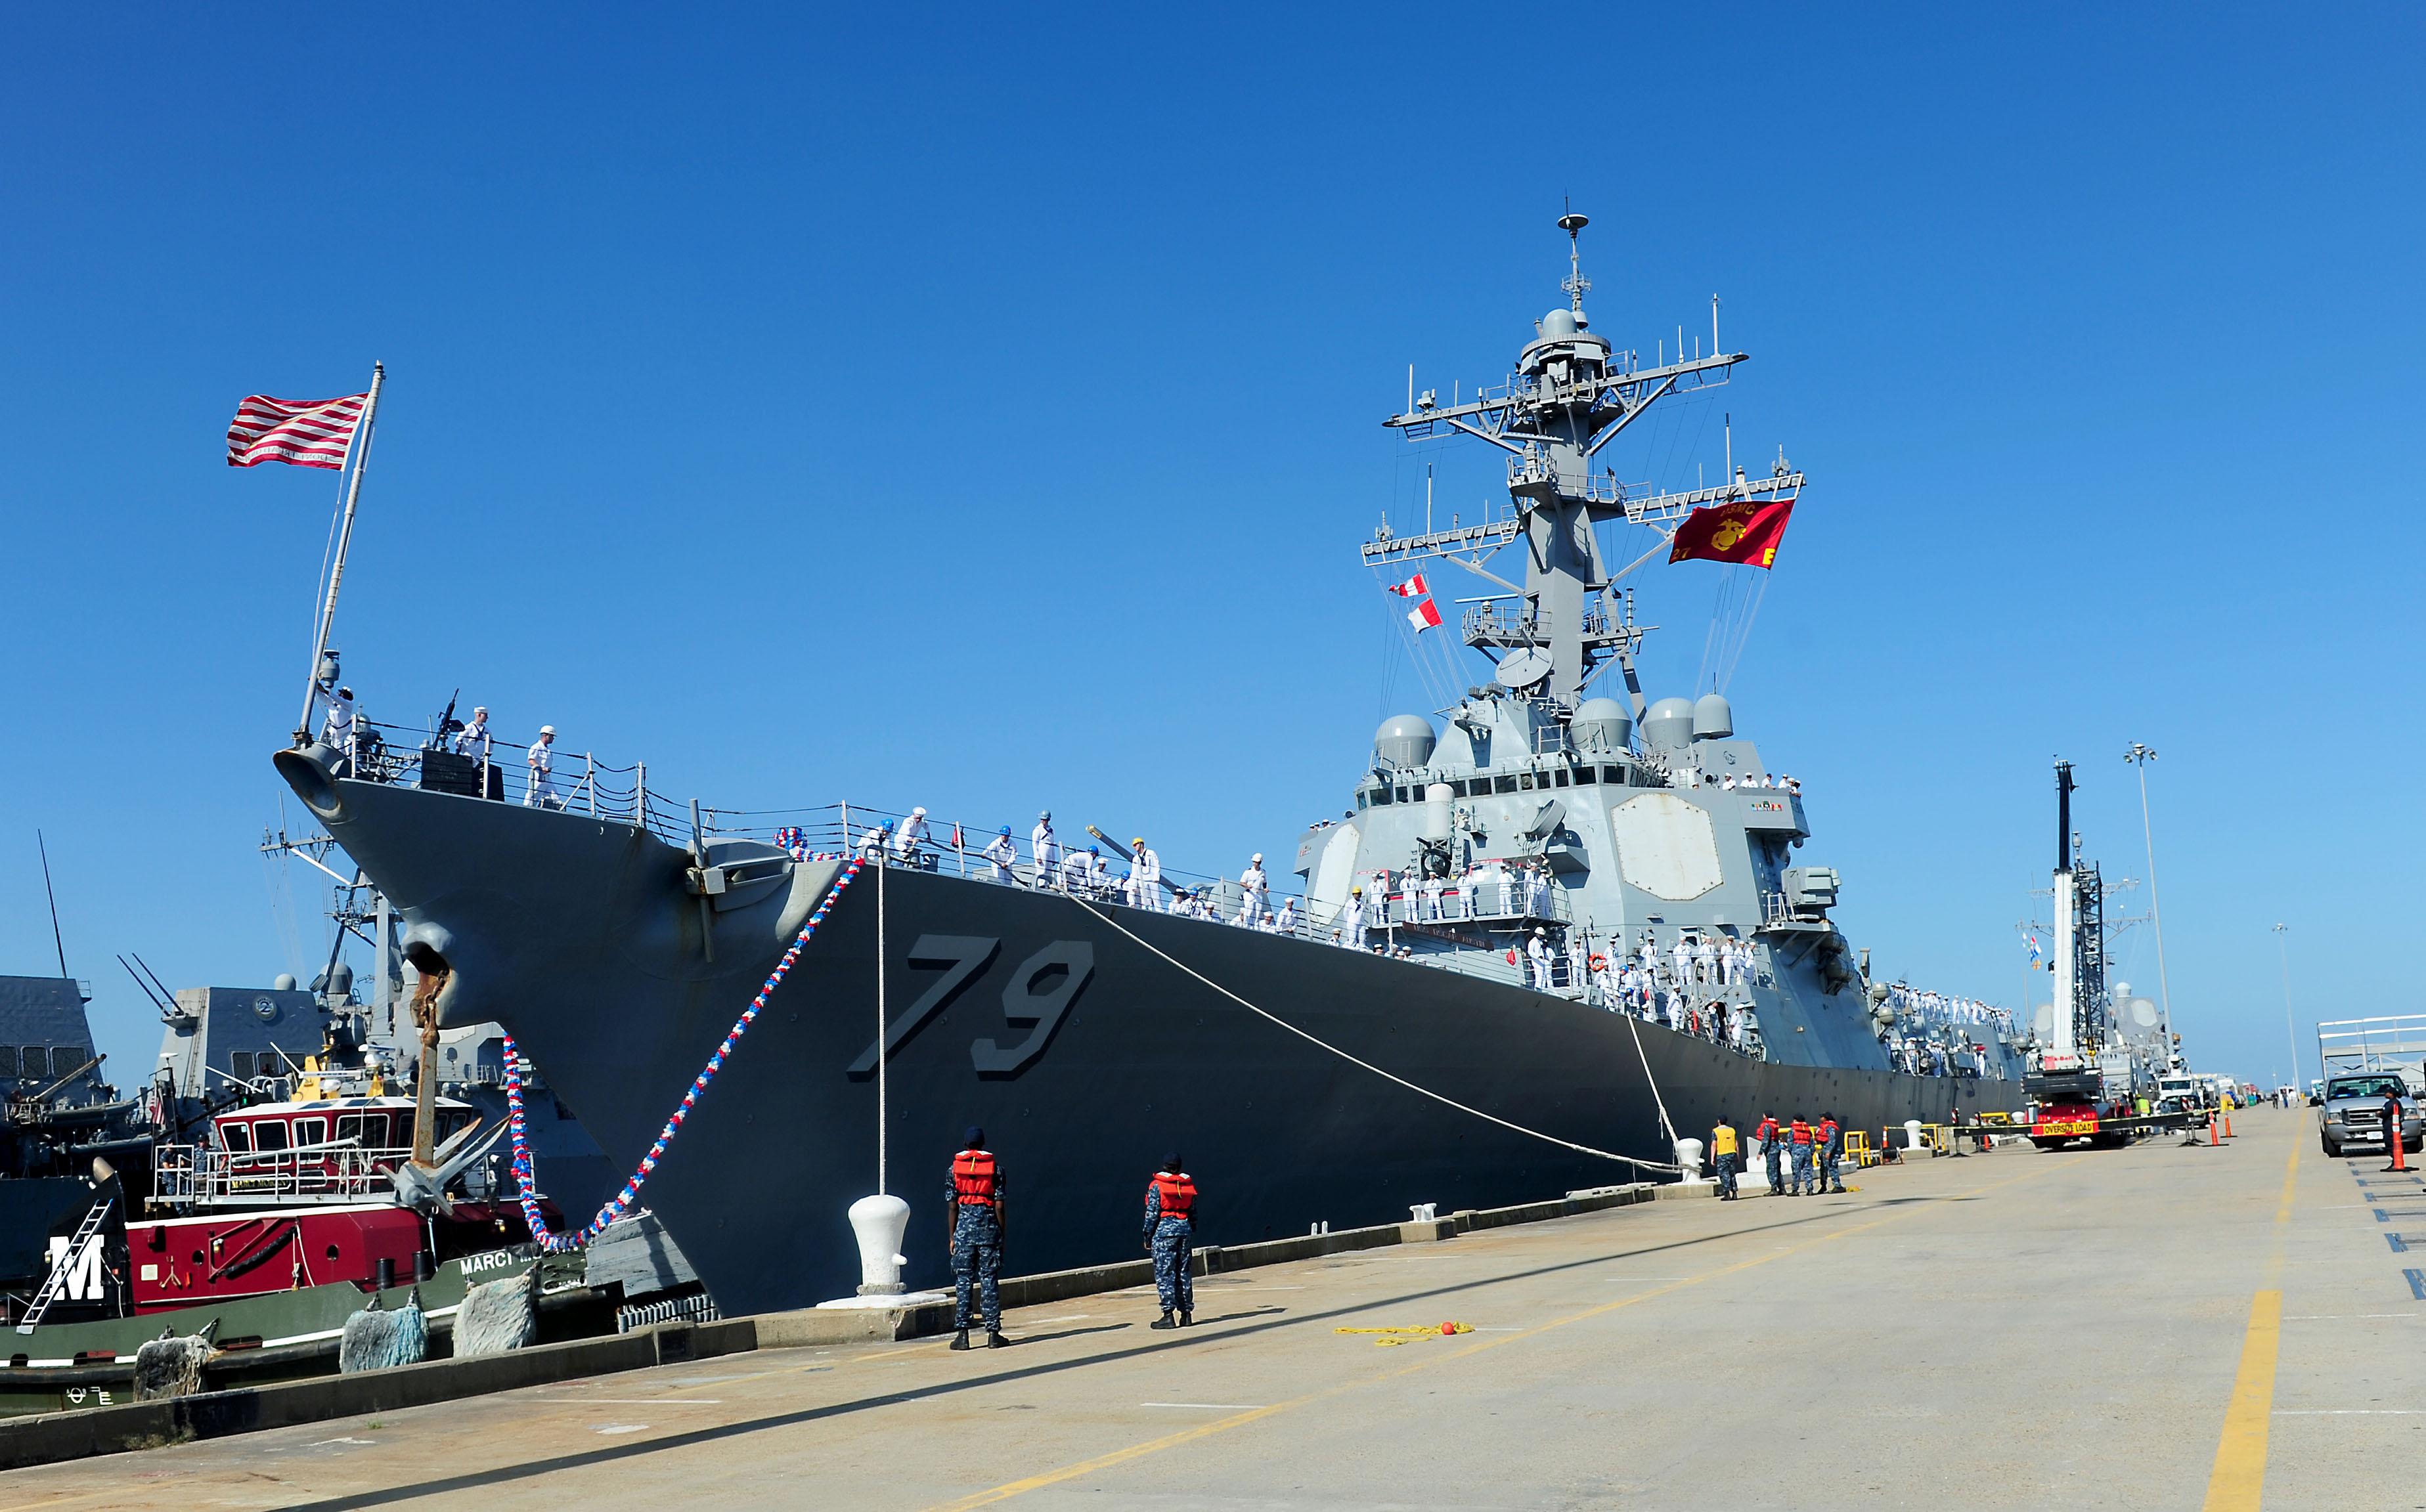 USS OSCAR AUSTIN DDG-79 Ankunft Norfolk am 10.07.2015 Bild: U.S. Navy